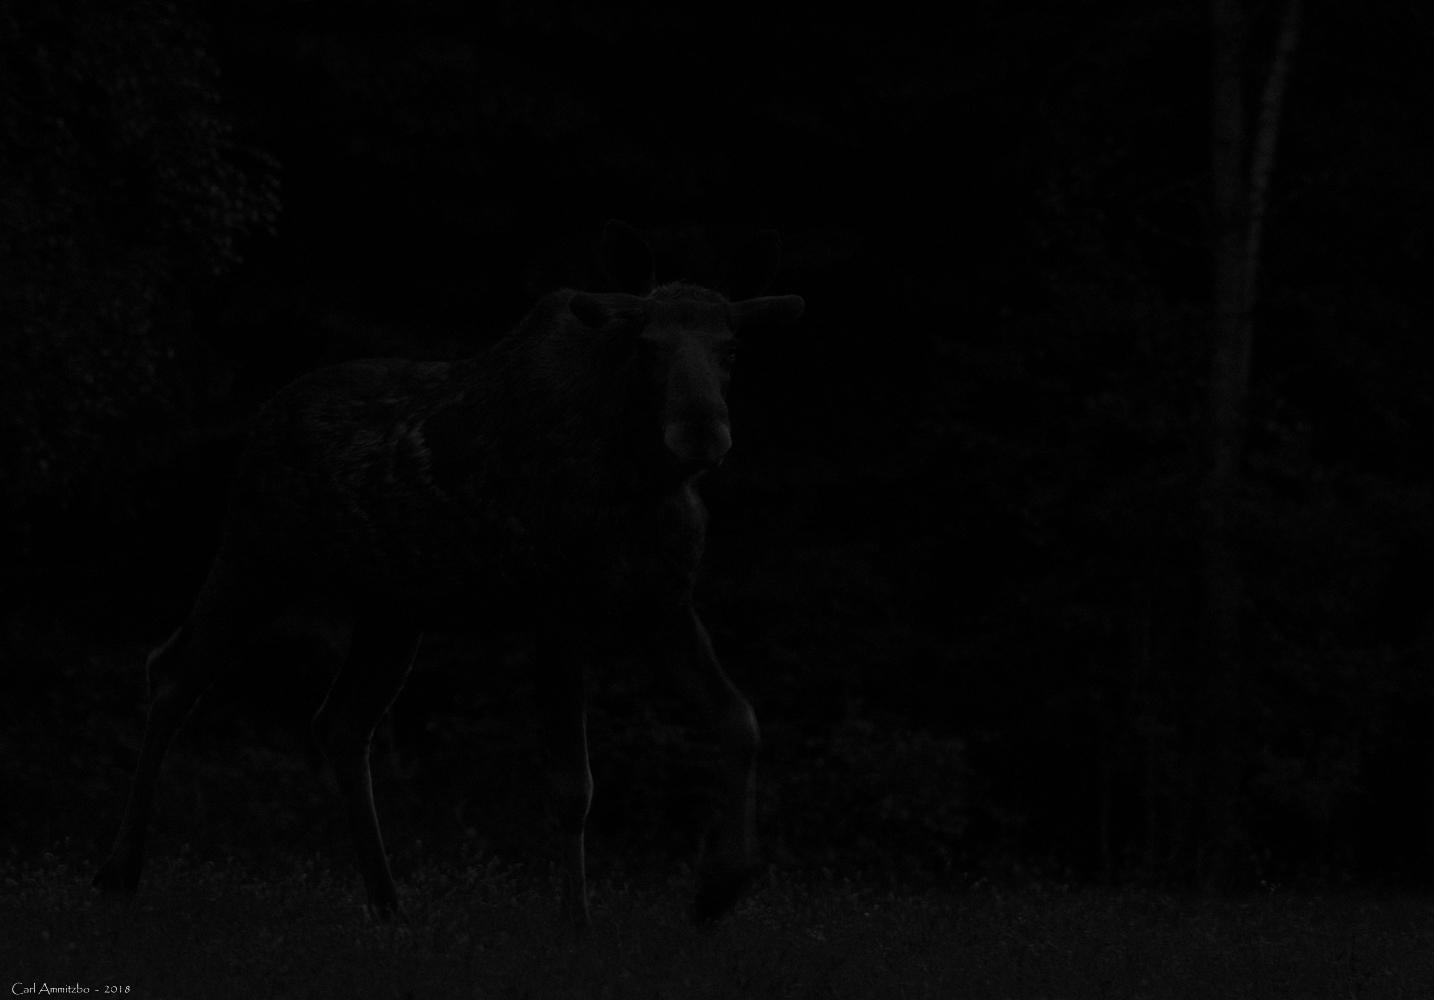 03 - 0522 - Elg i mørket - 02 - Bergslagen